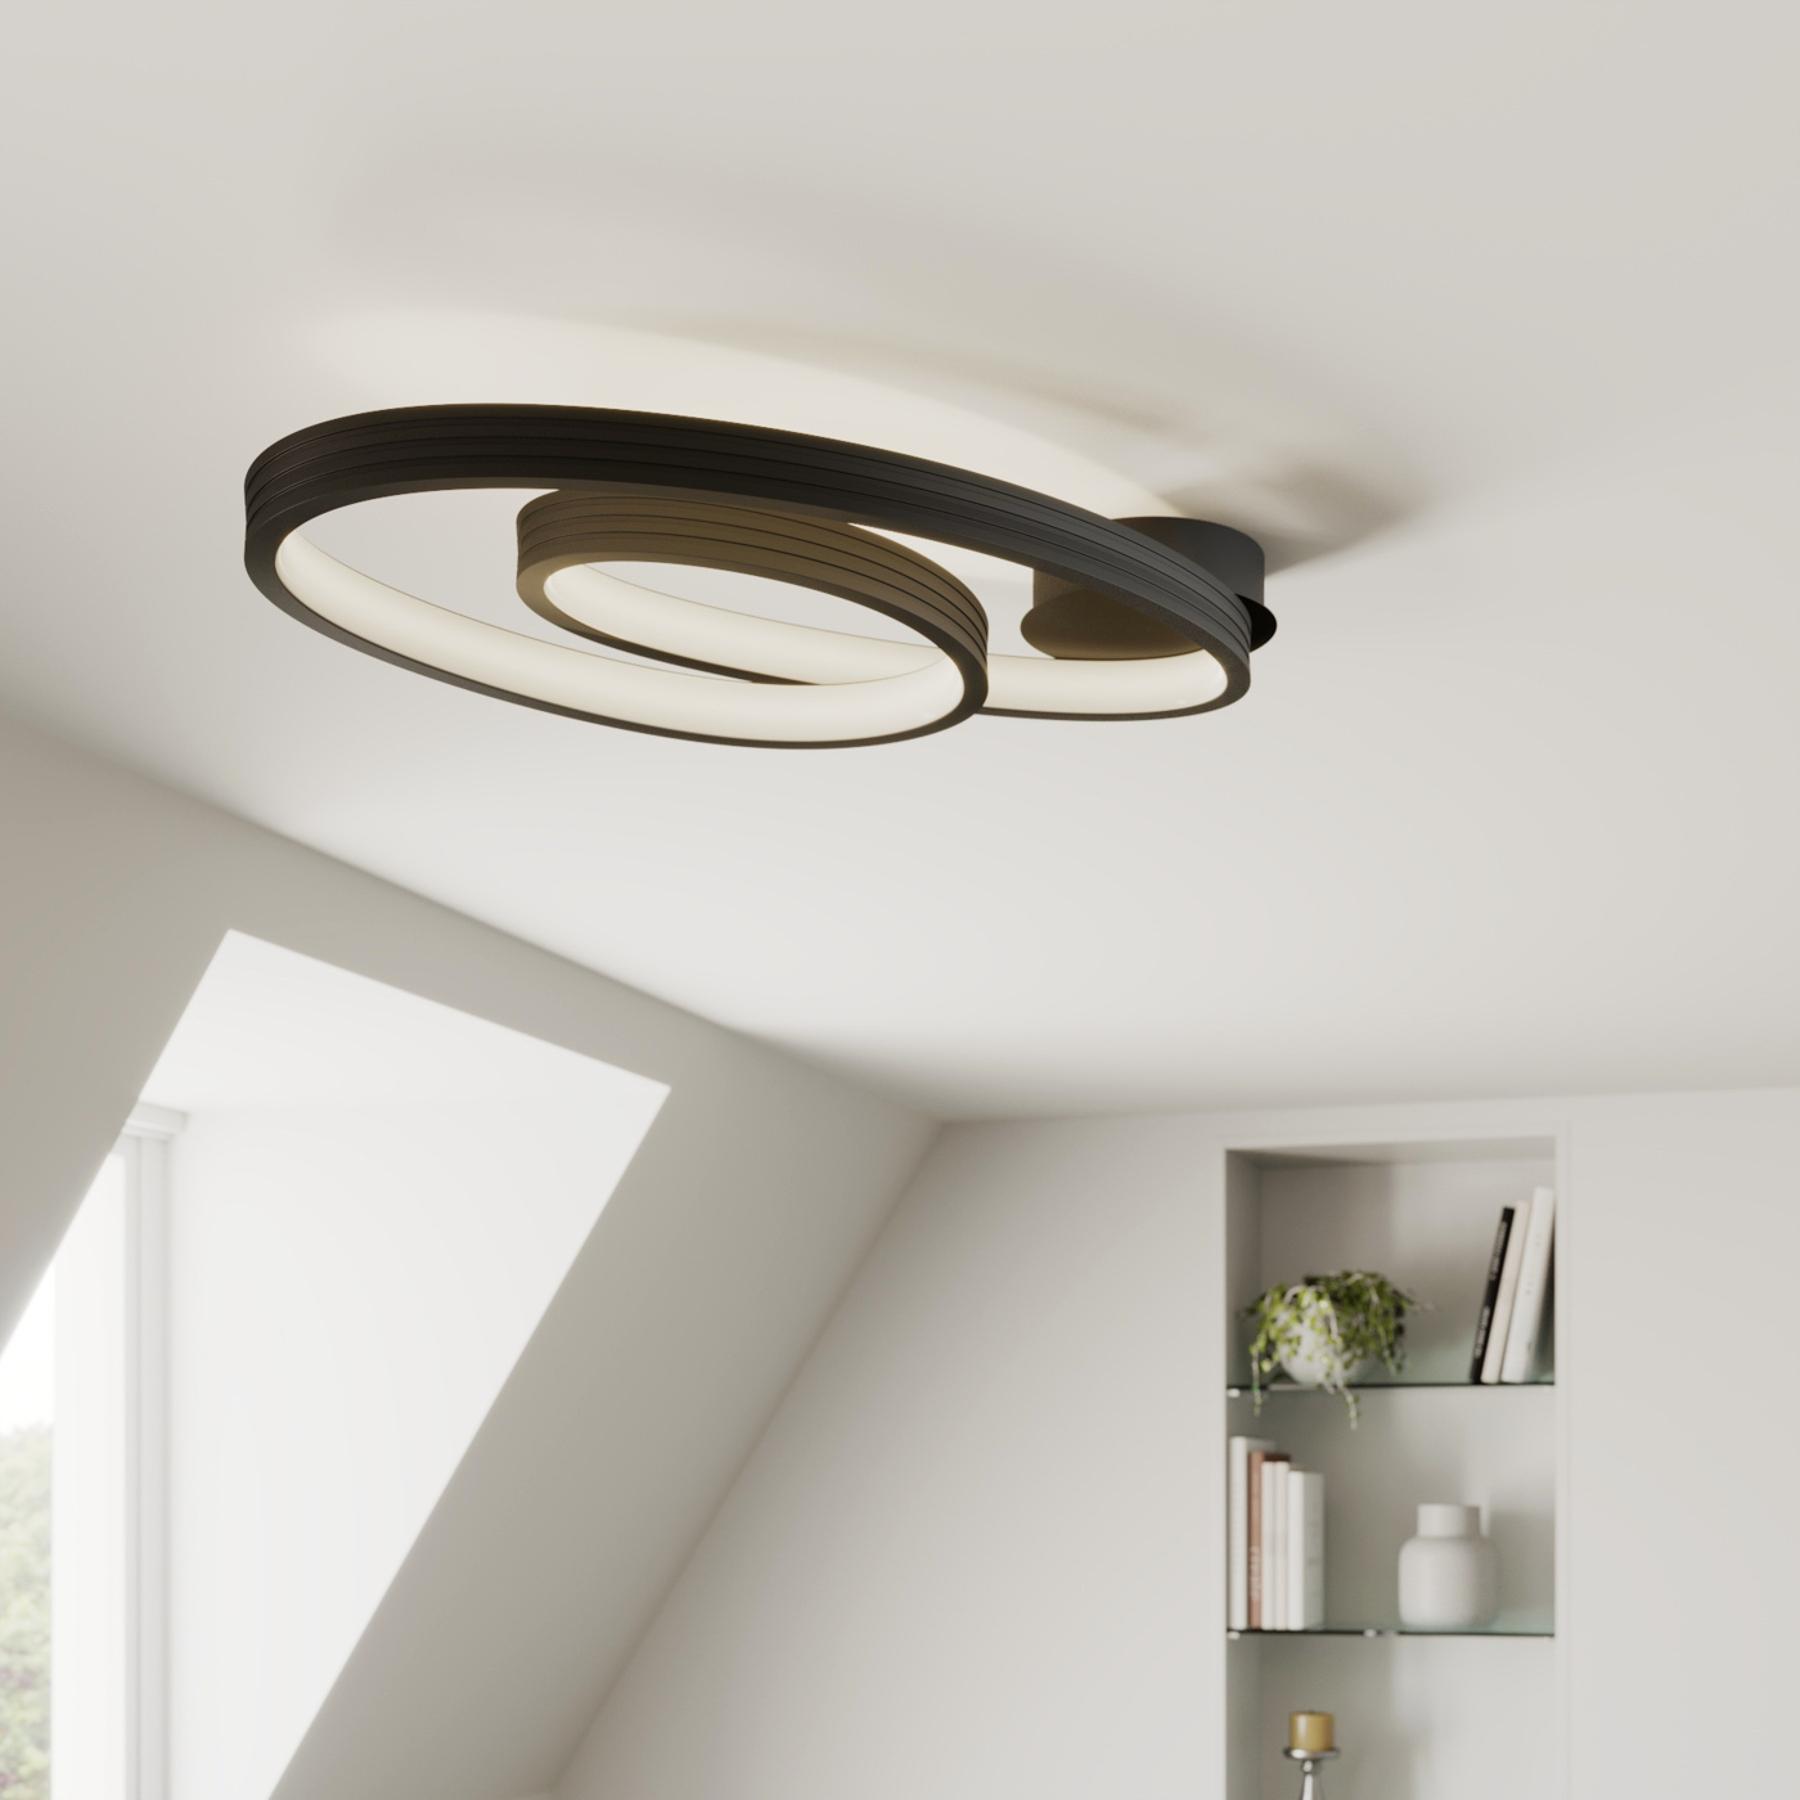 Lucande Bronwyn lampa sufitowa LED, 72,5 cm